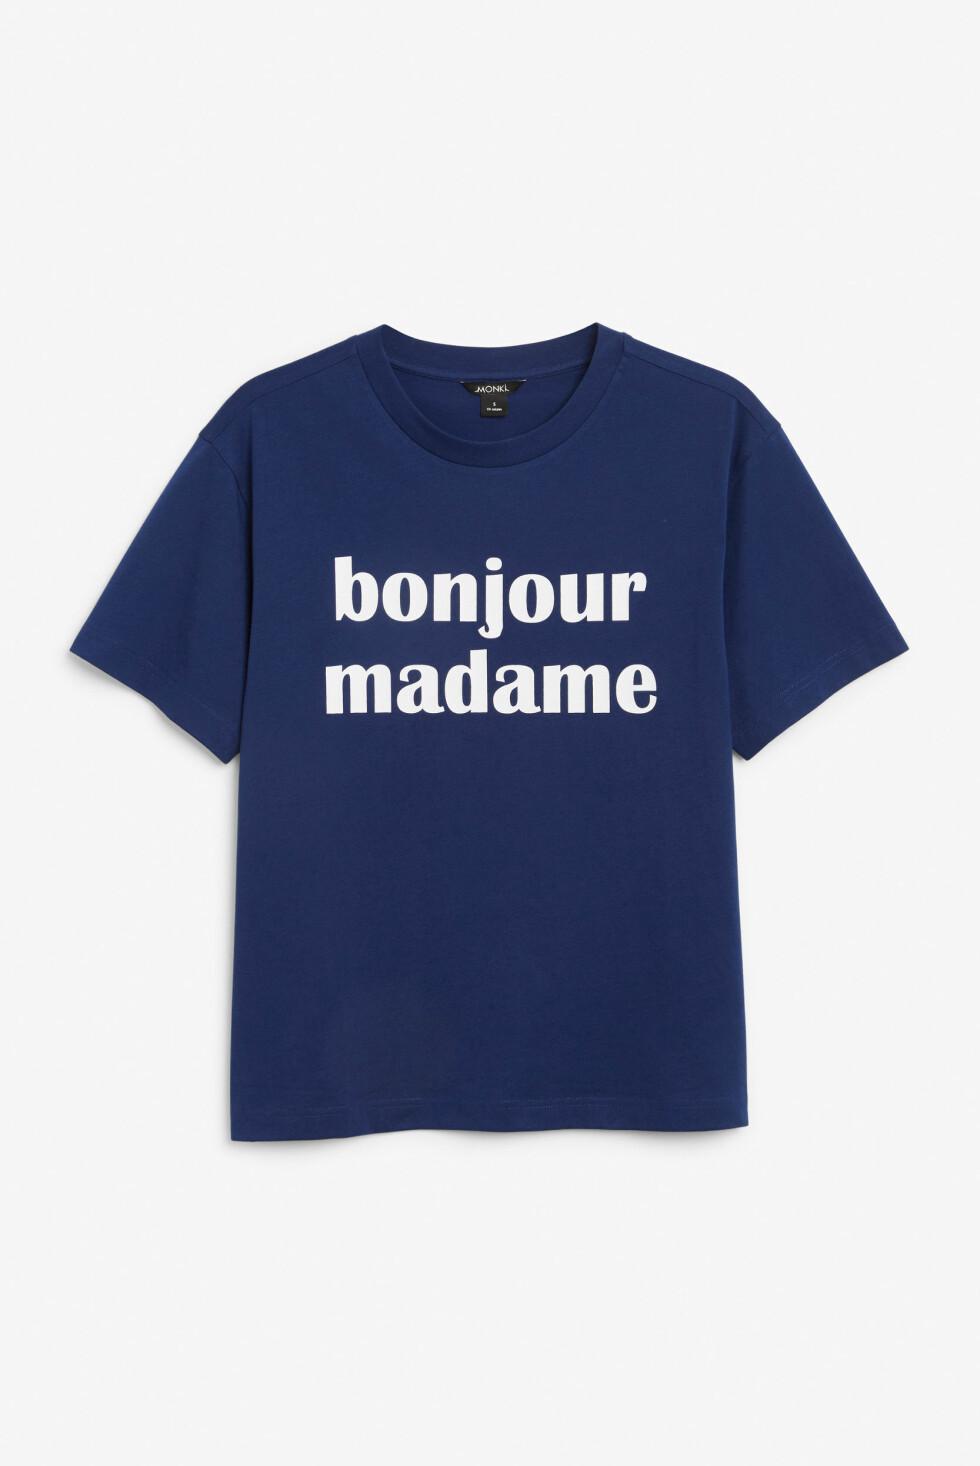 T-skjorte fra Monki |120,-|https://www.monki.com/en_sek/clothing/tops/t-shirts/_jcr_content/productlisting.display/product.oversized-tee-bonjour-madame.0562598012.html